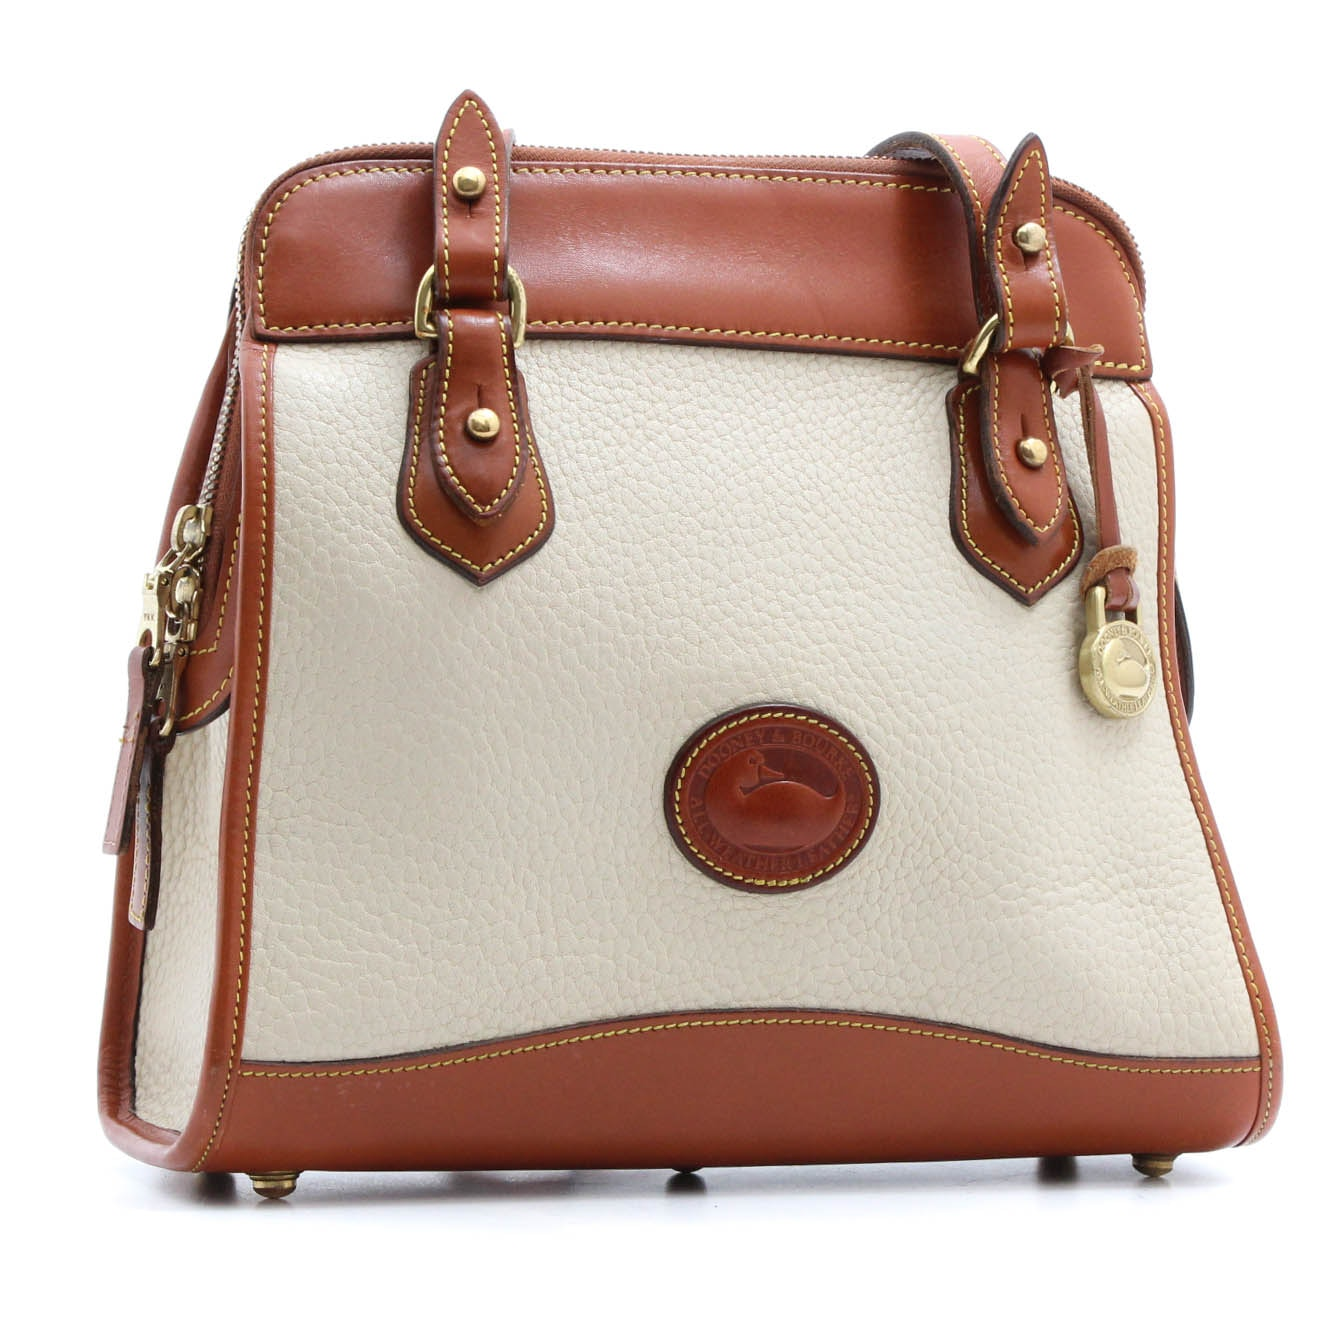 Vintage Dooney & Bourke Pebbled Leather Handbag